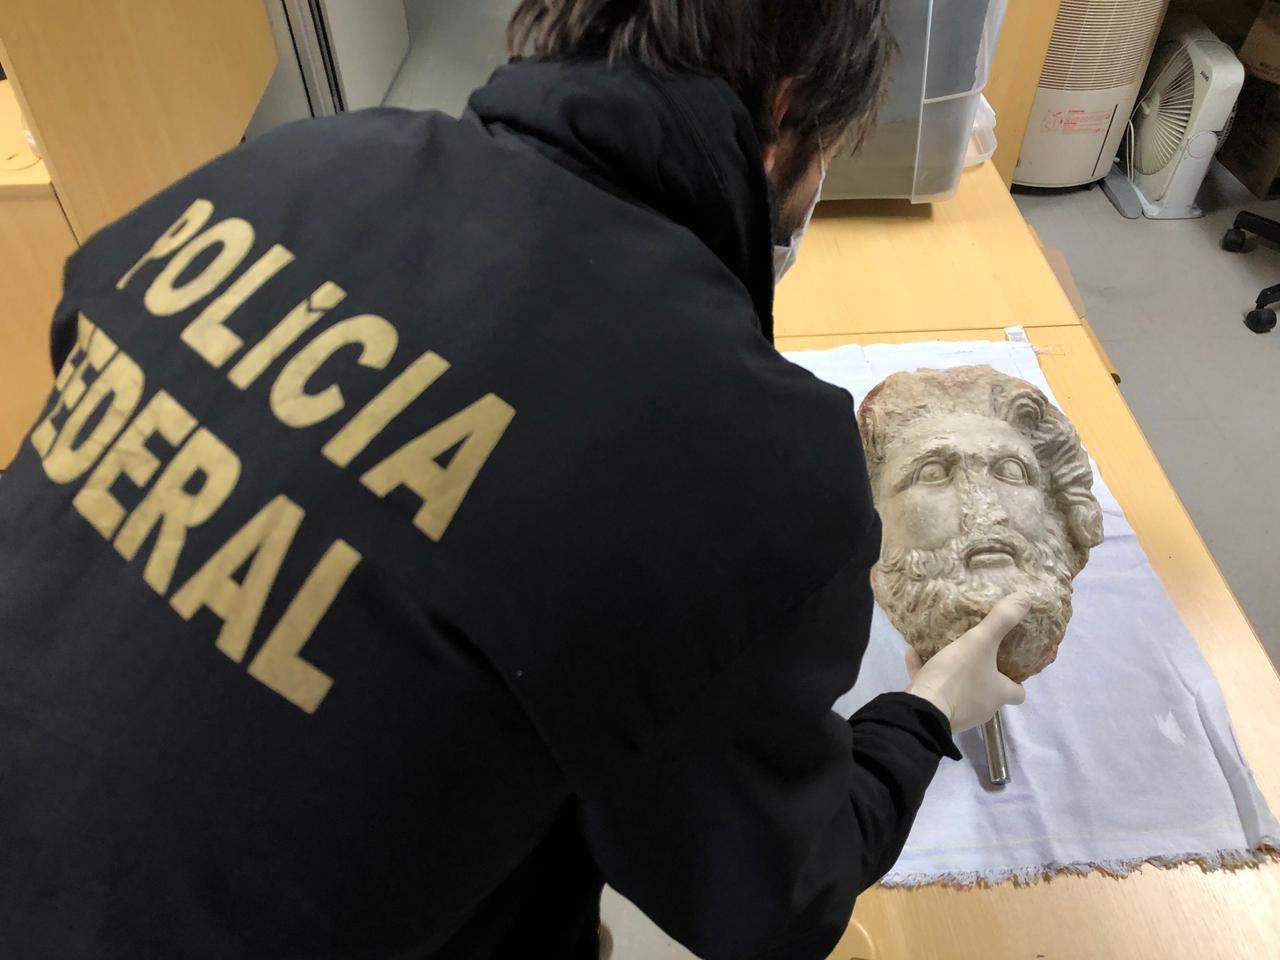 Polícia Federal apreende escultura